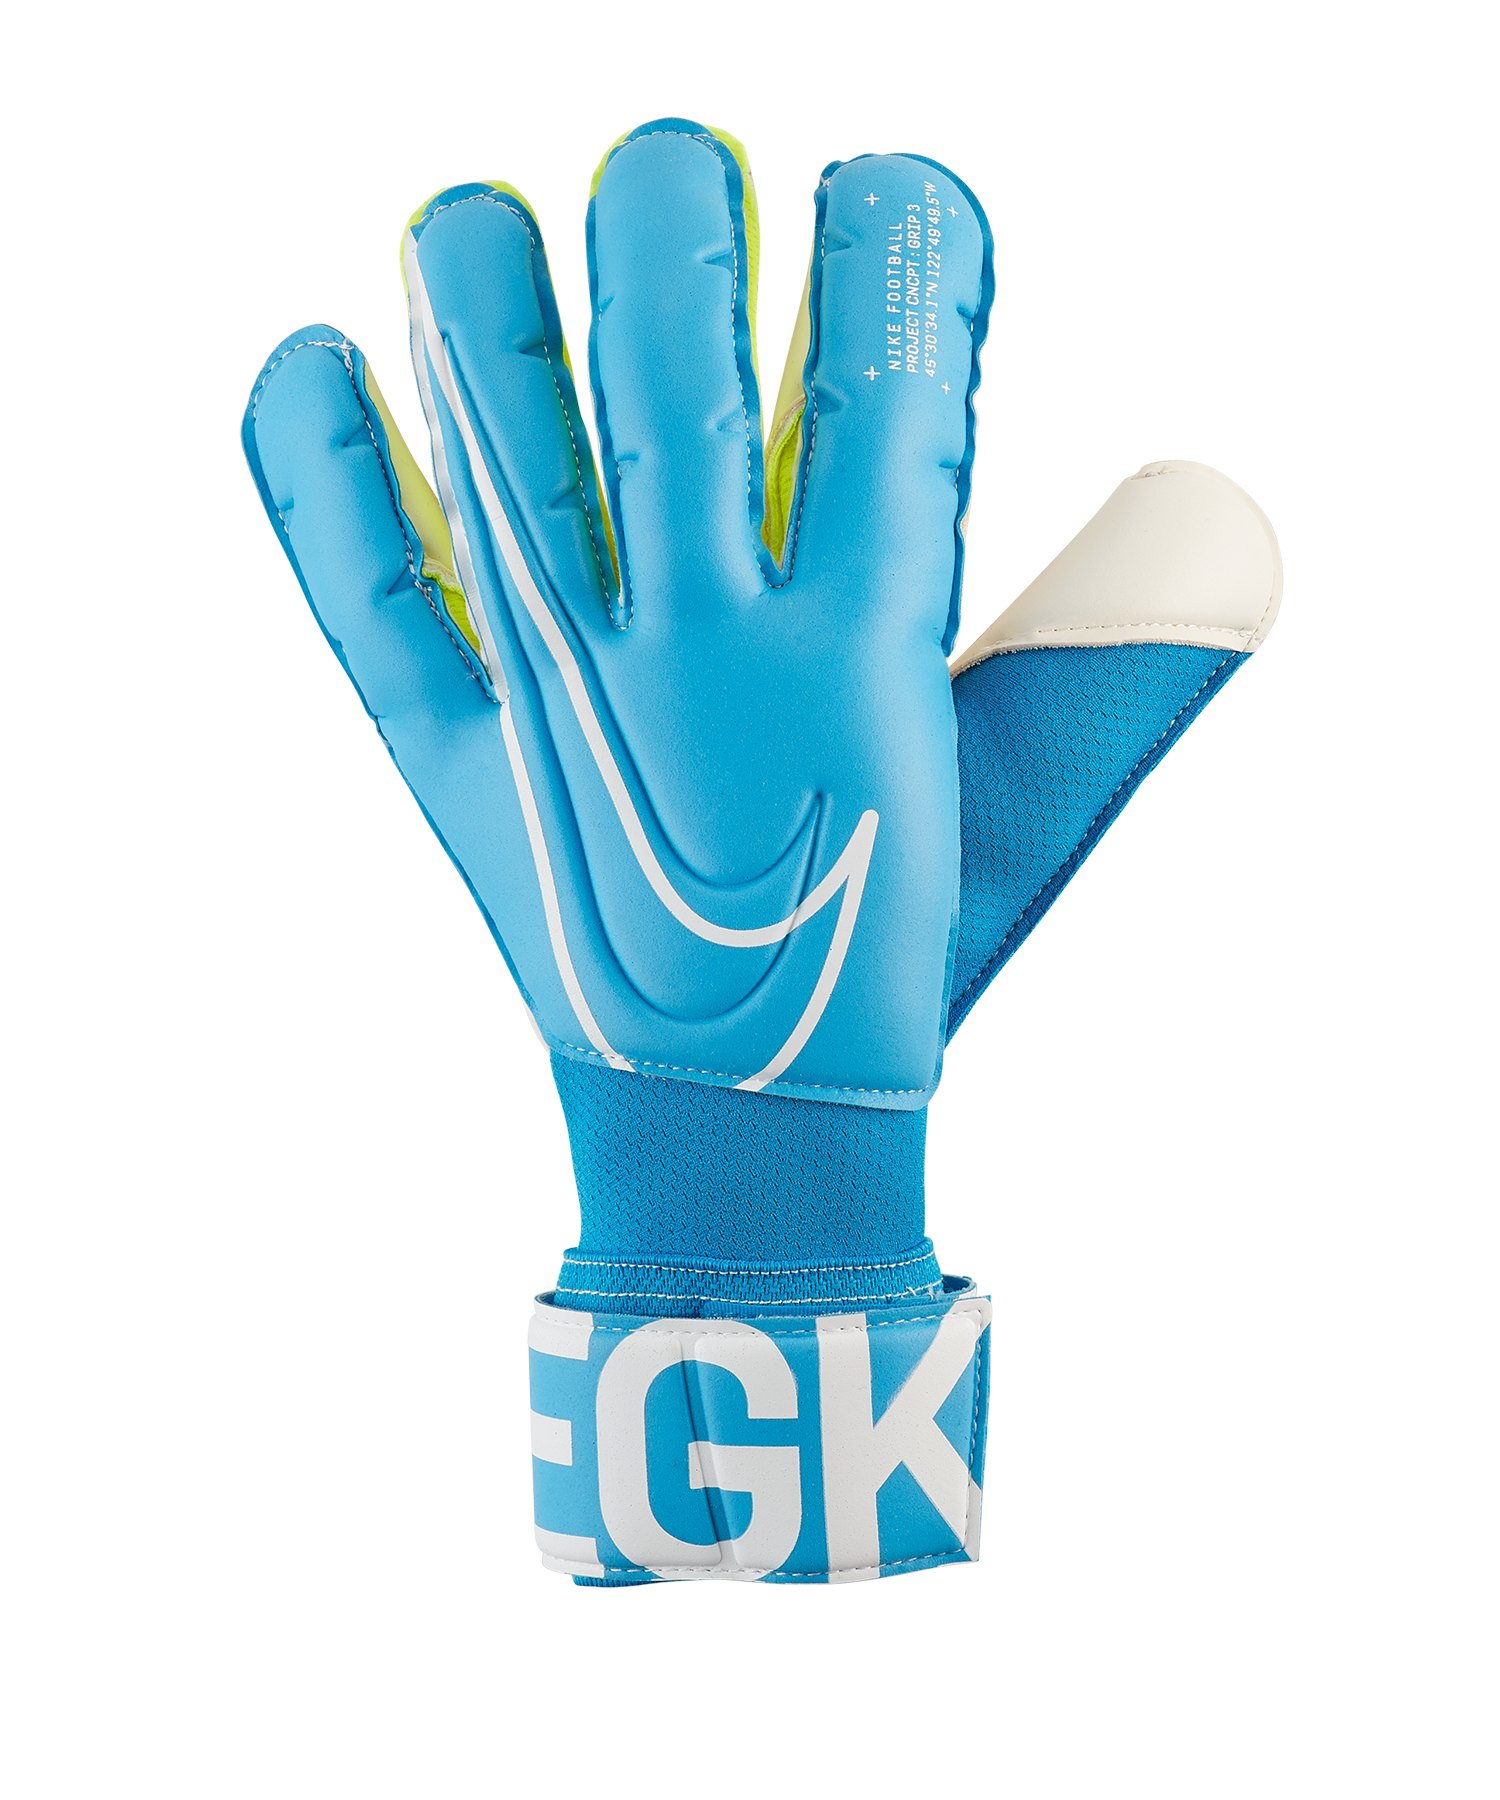 Nike Grip 3 Torwarthandschuh Blau F486 - blau